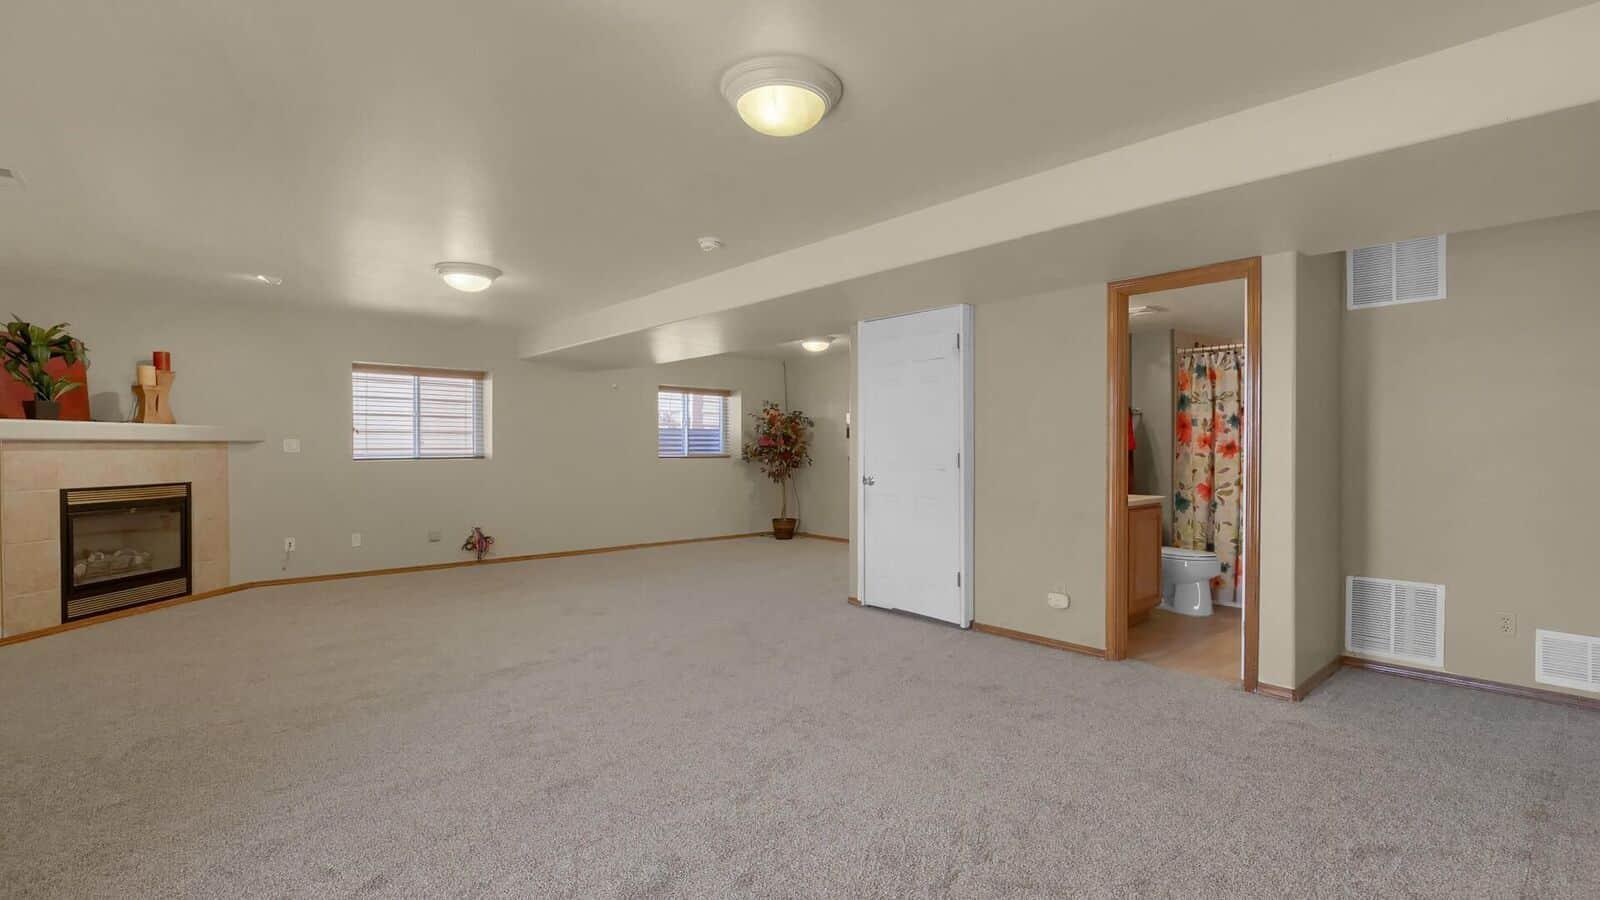 Large Open Walk-Out Basement Rec Room